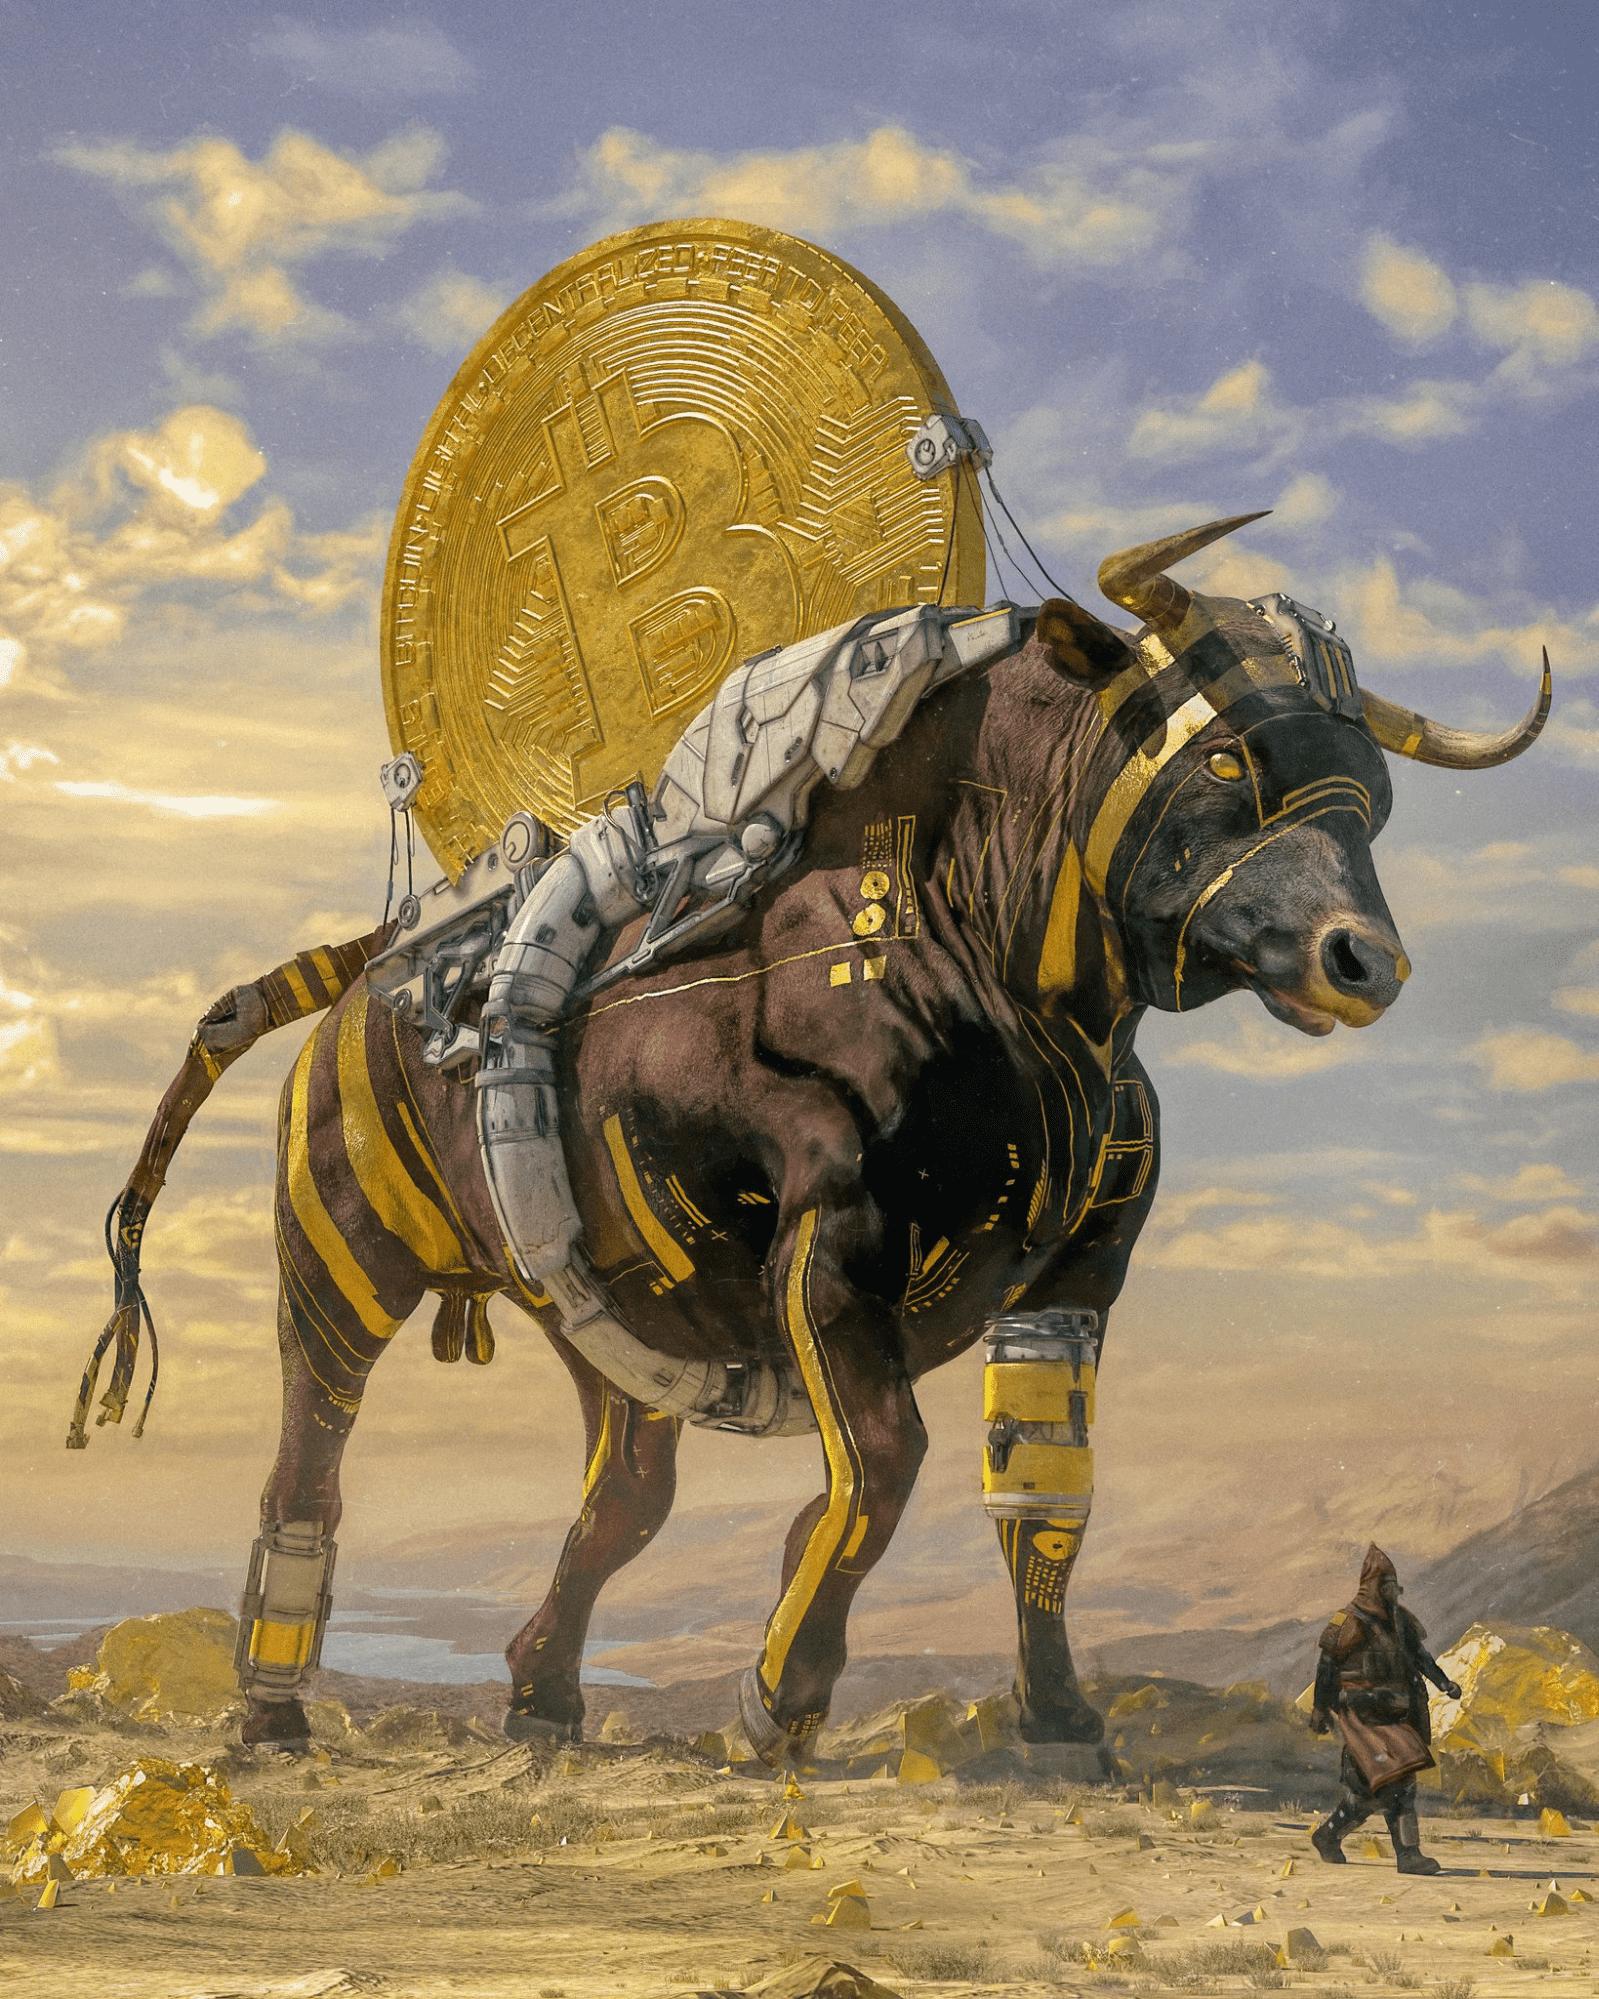 Bull Run #120/271 by Beeple